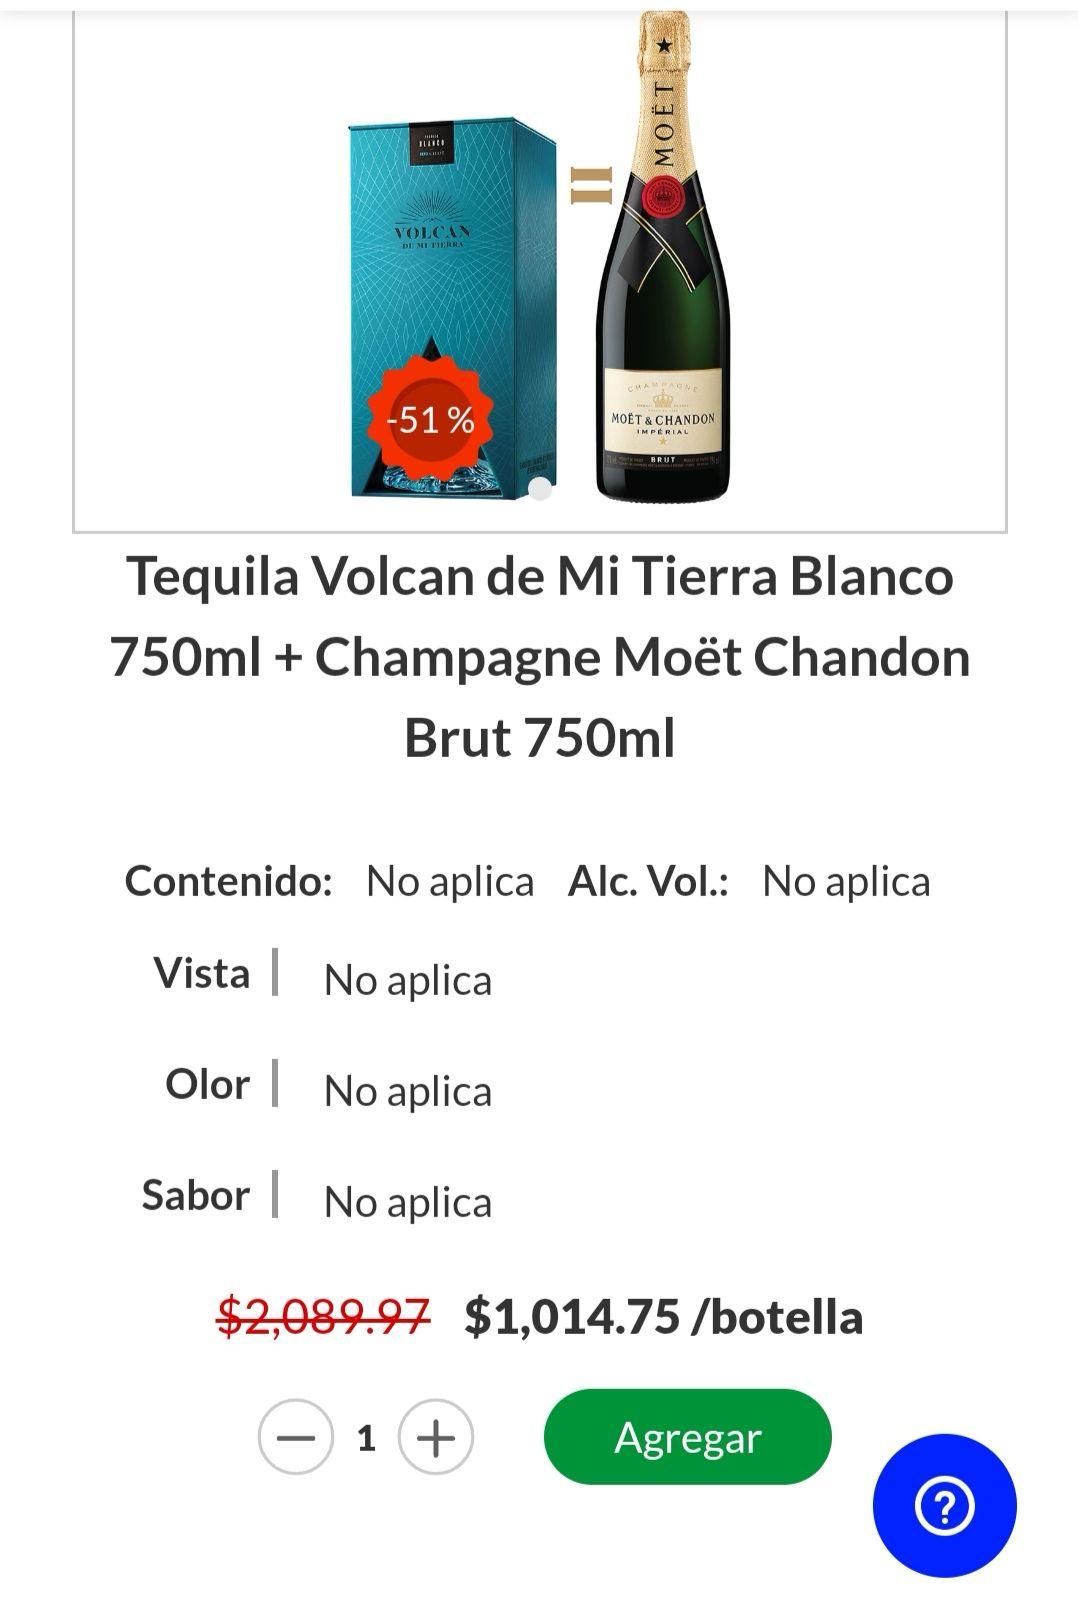 La Europea: Botella de Tequila volcán de mi tierra + Moët